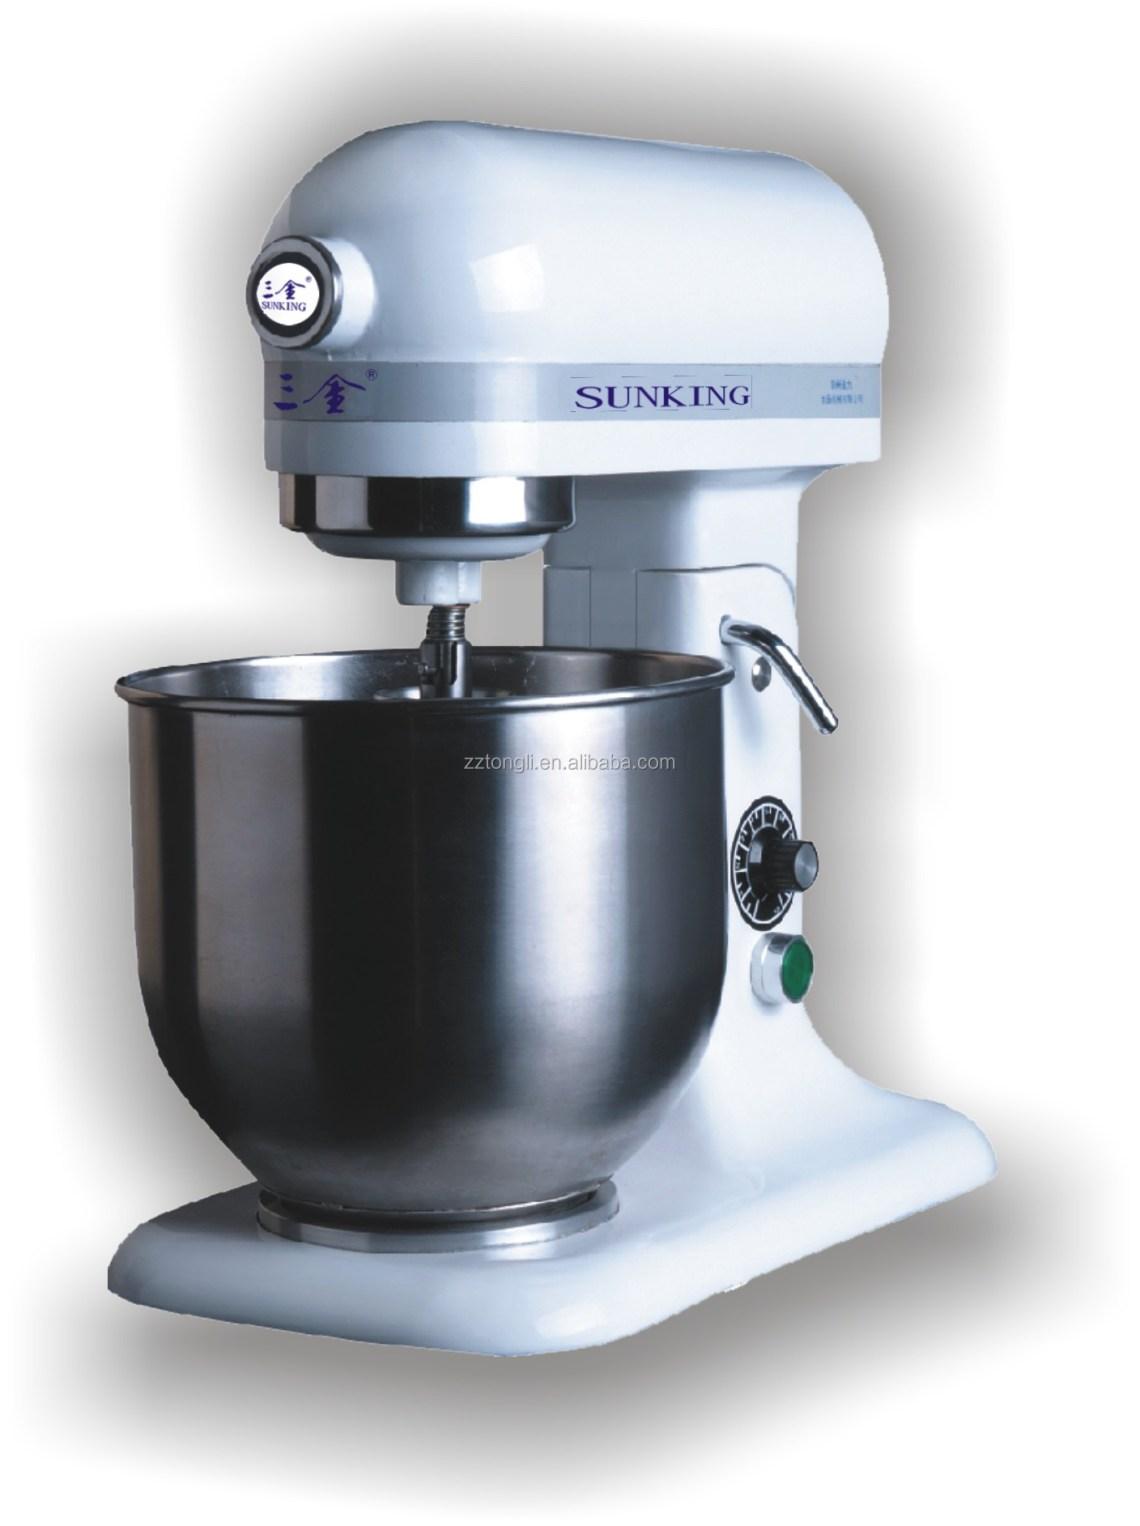 Image Result For Kitchenaid Mixer In Kitchen